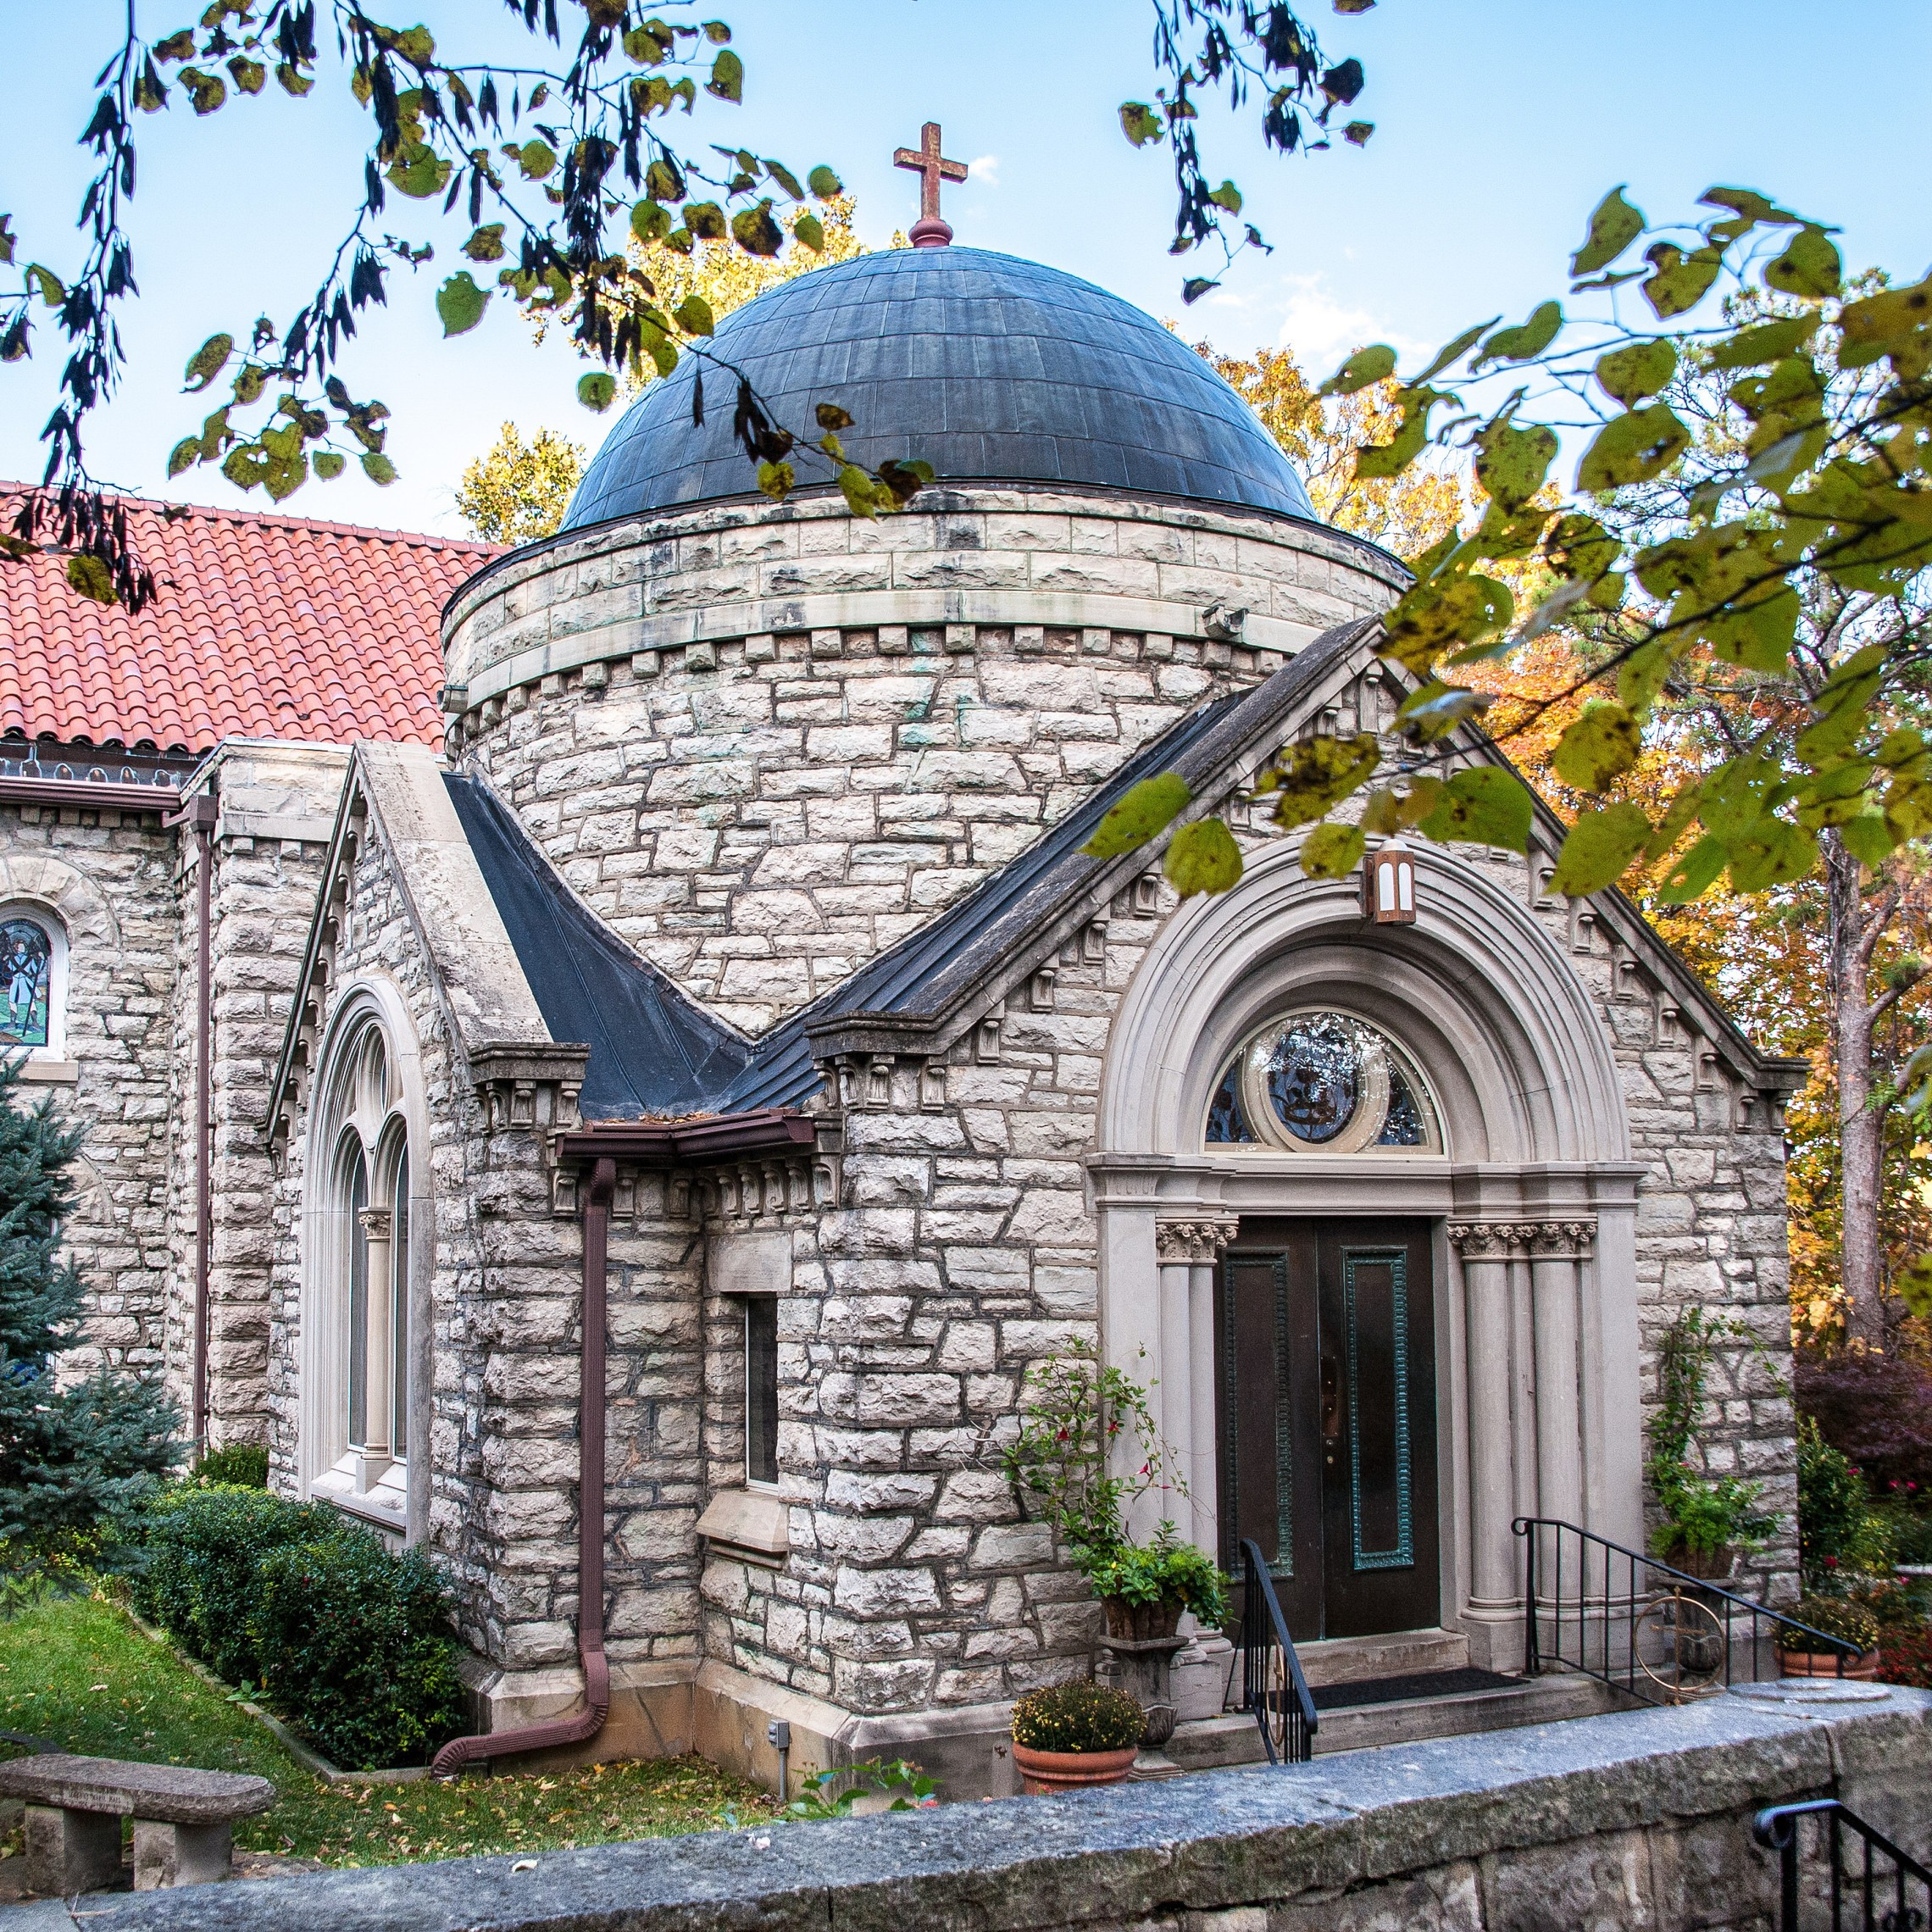 Church Outside Dome